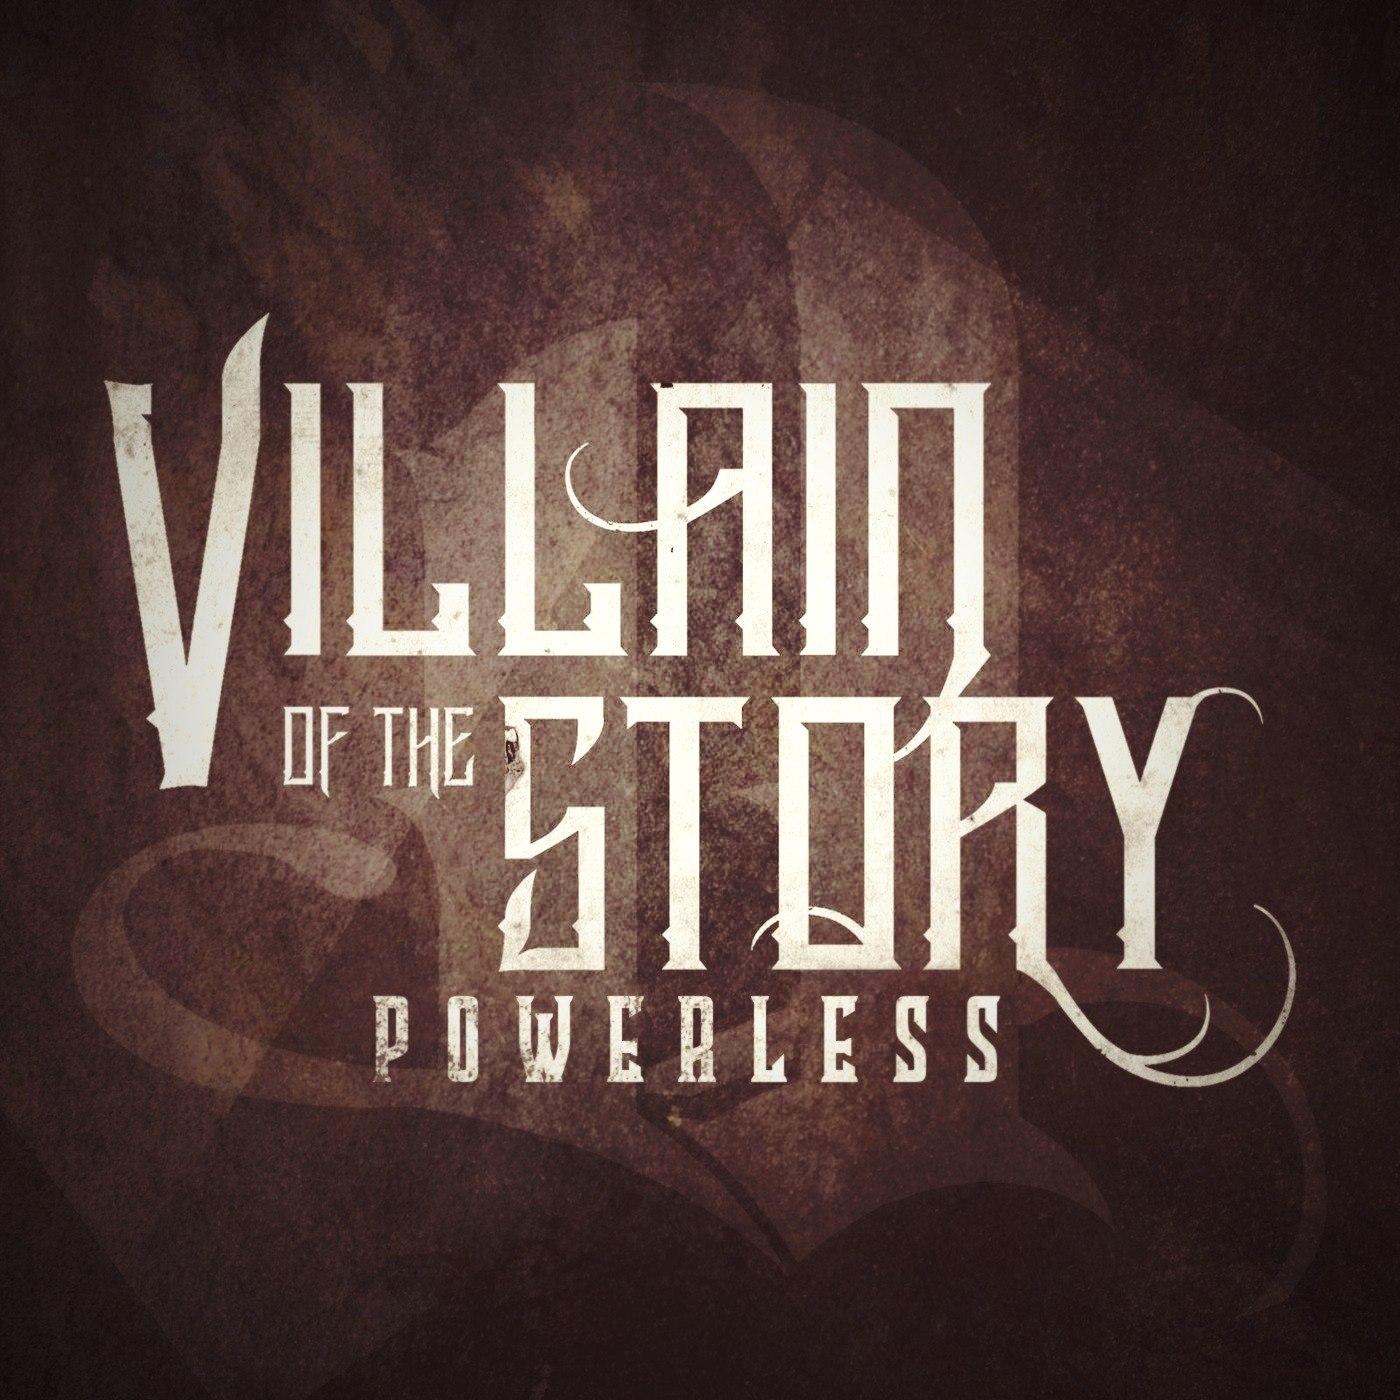 Villain of the Story - Powerless [single] (2016)